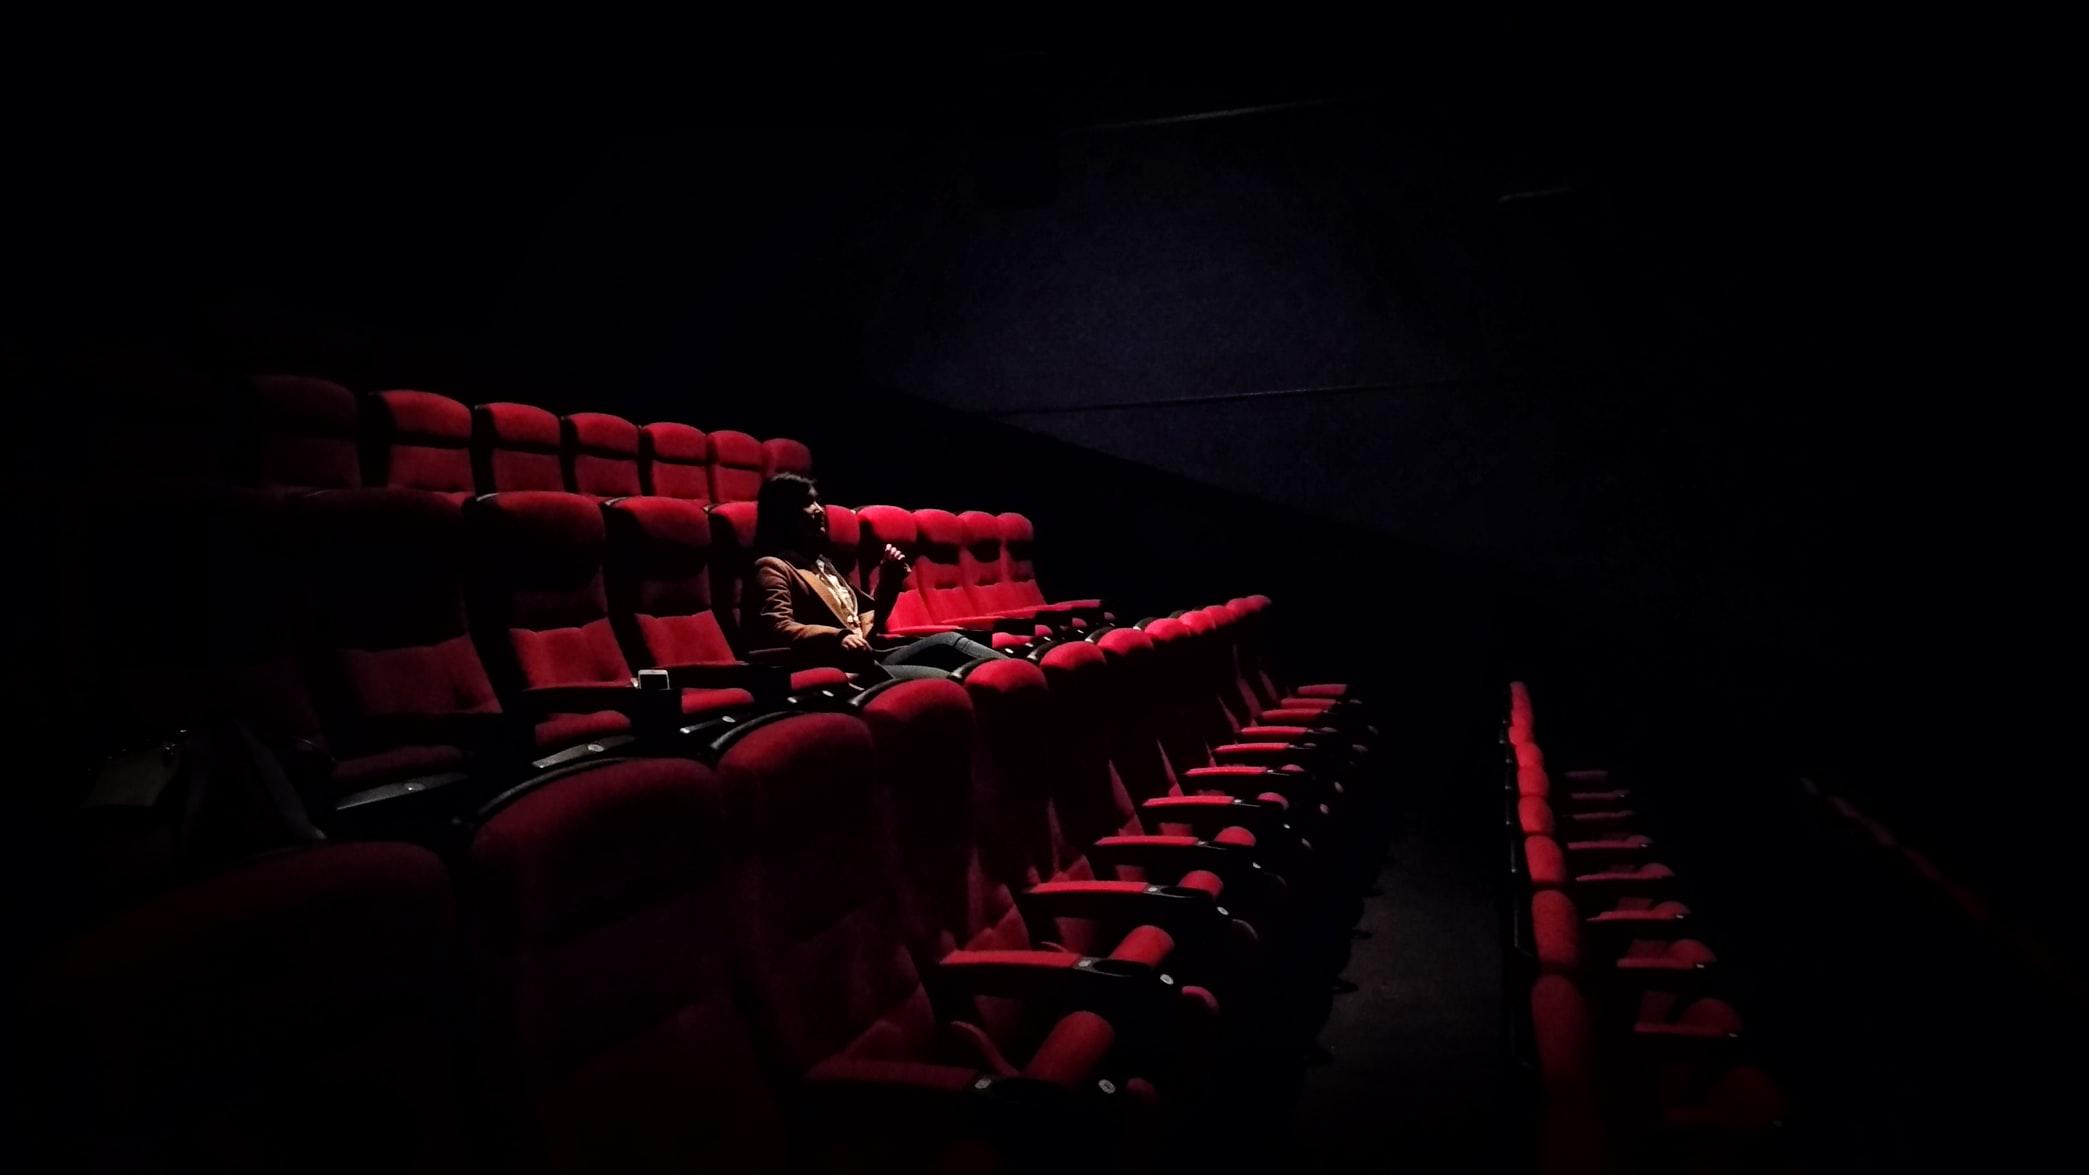 Tiyatro sektörü